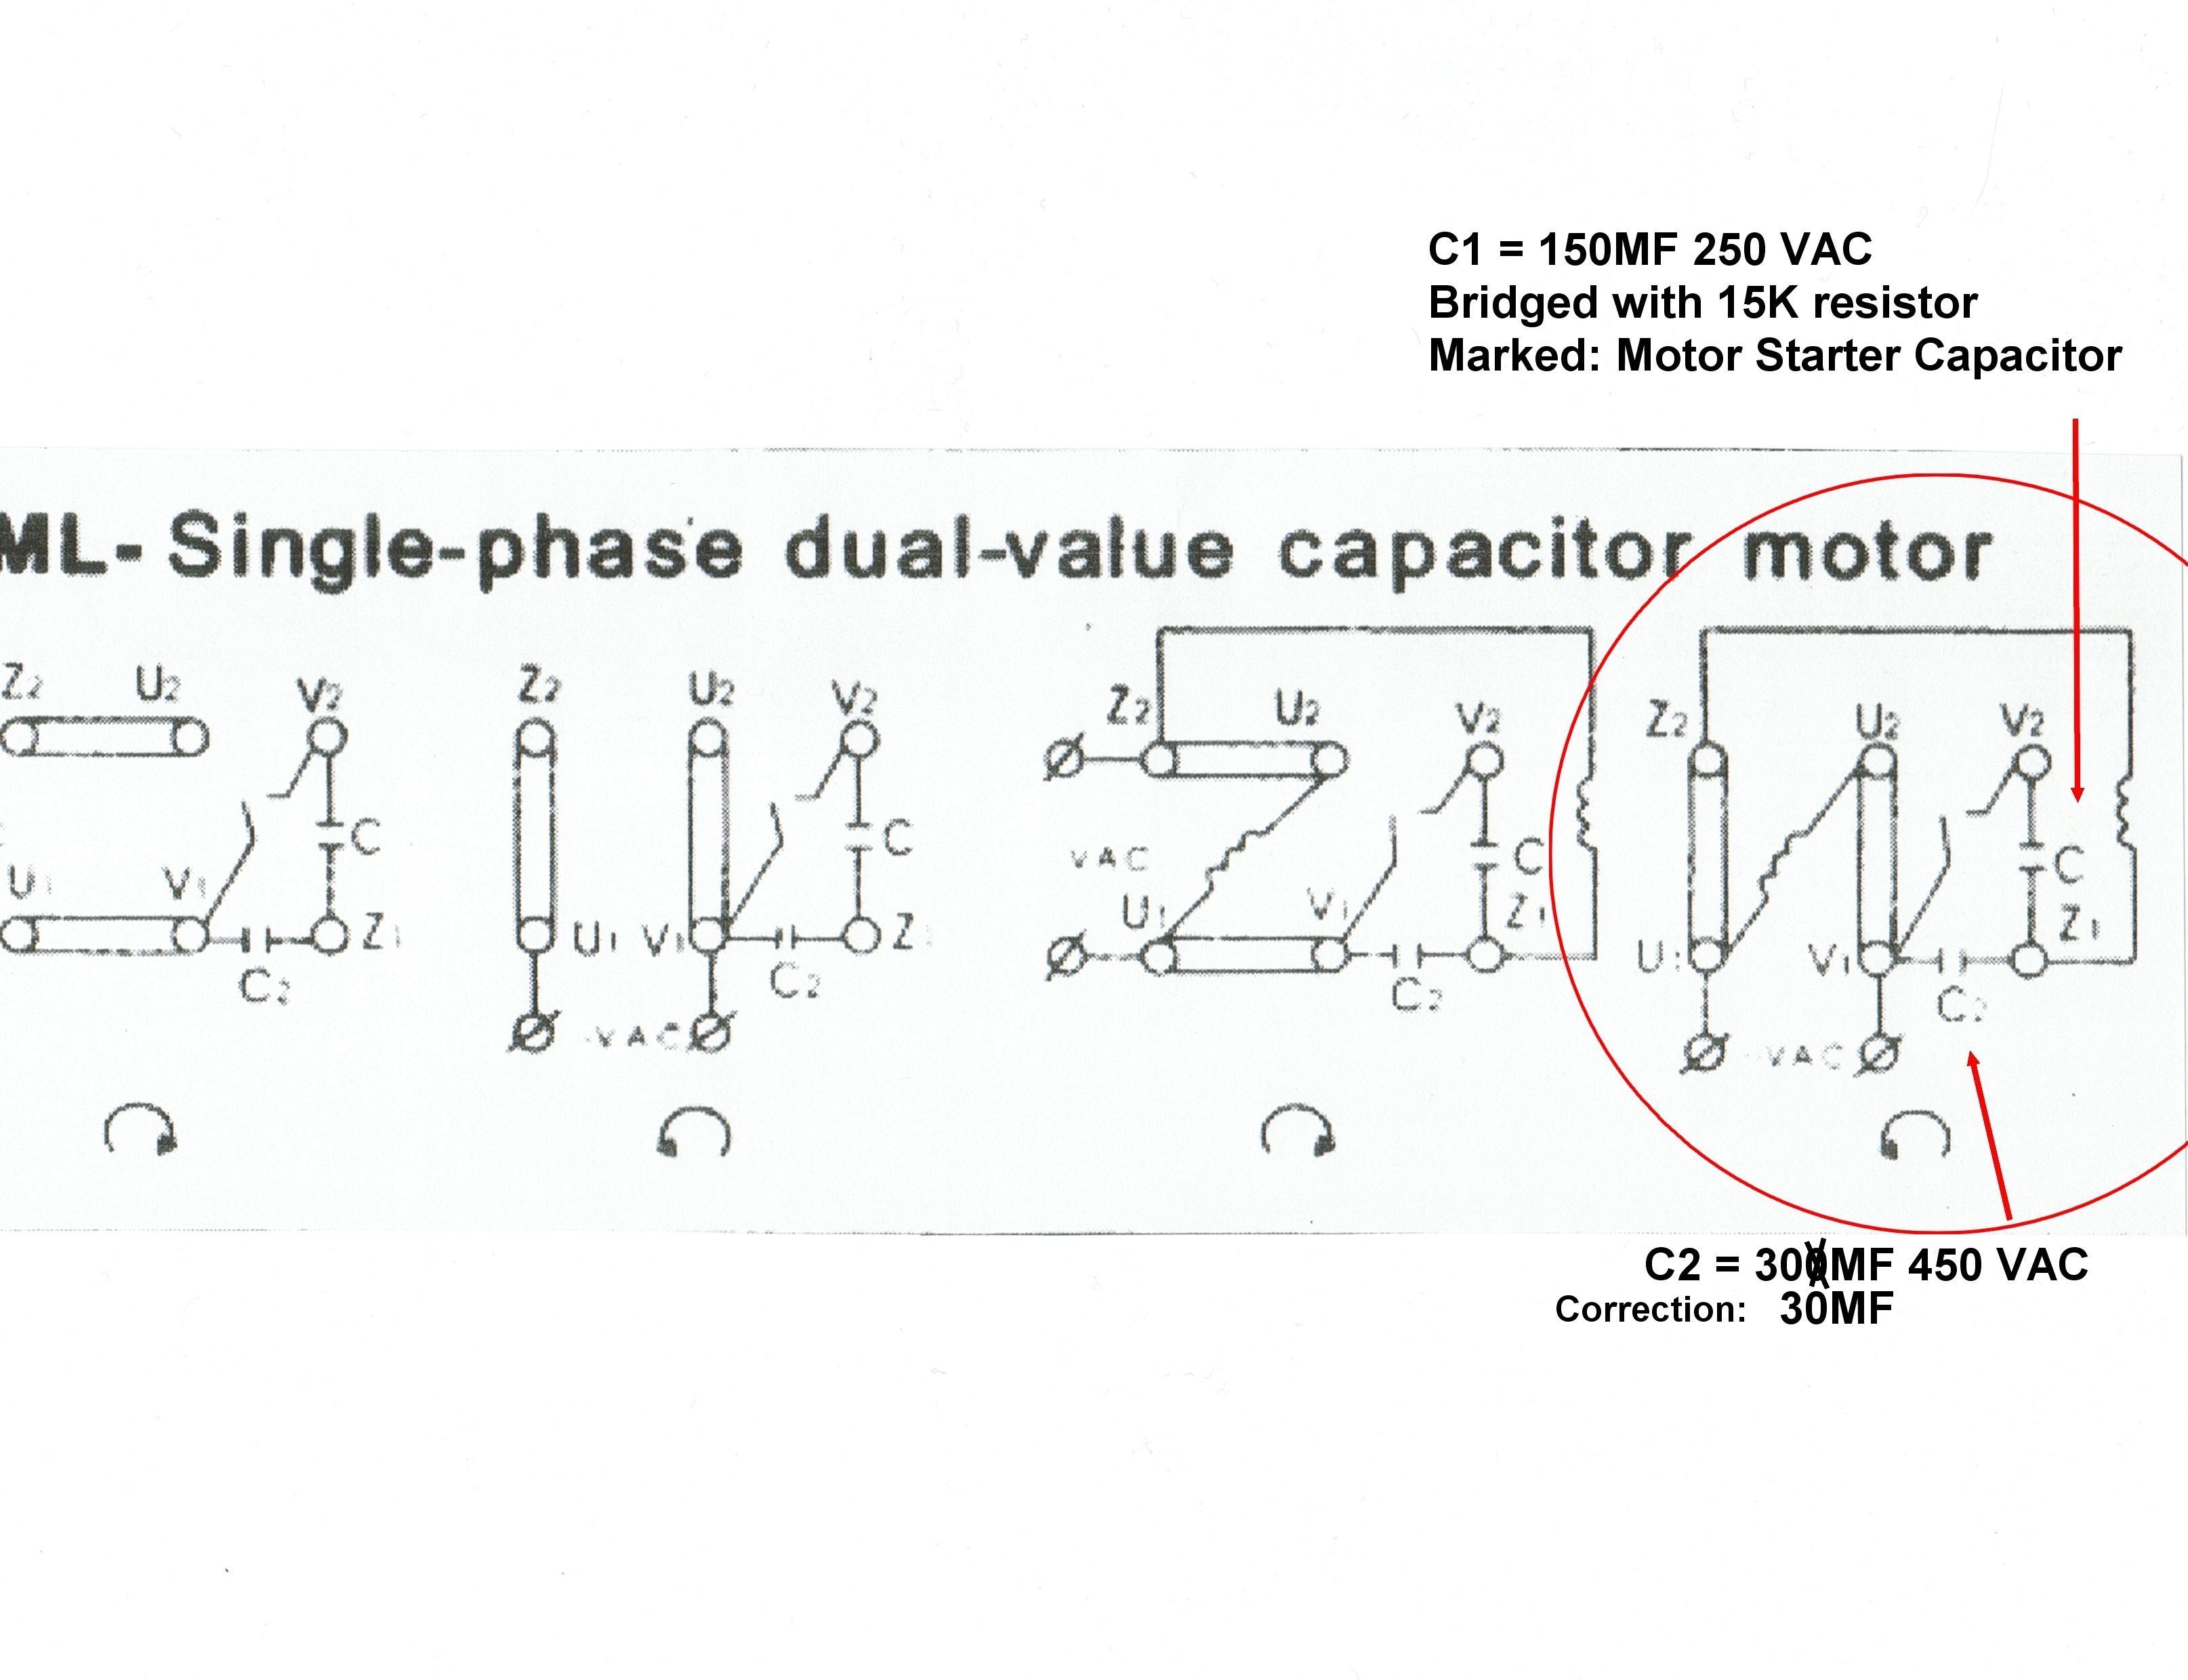 Wiring Diagram Electric Motor Reverse New Ac Motor Wiring Diagram Single Phase Free Download